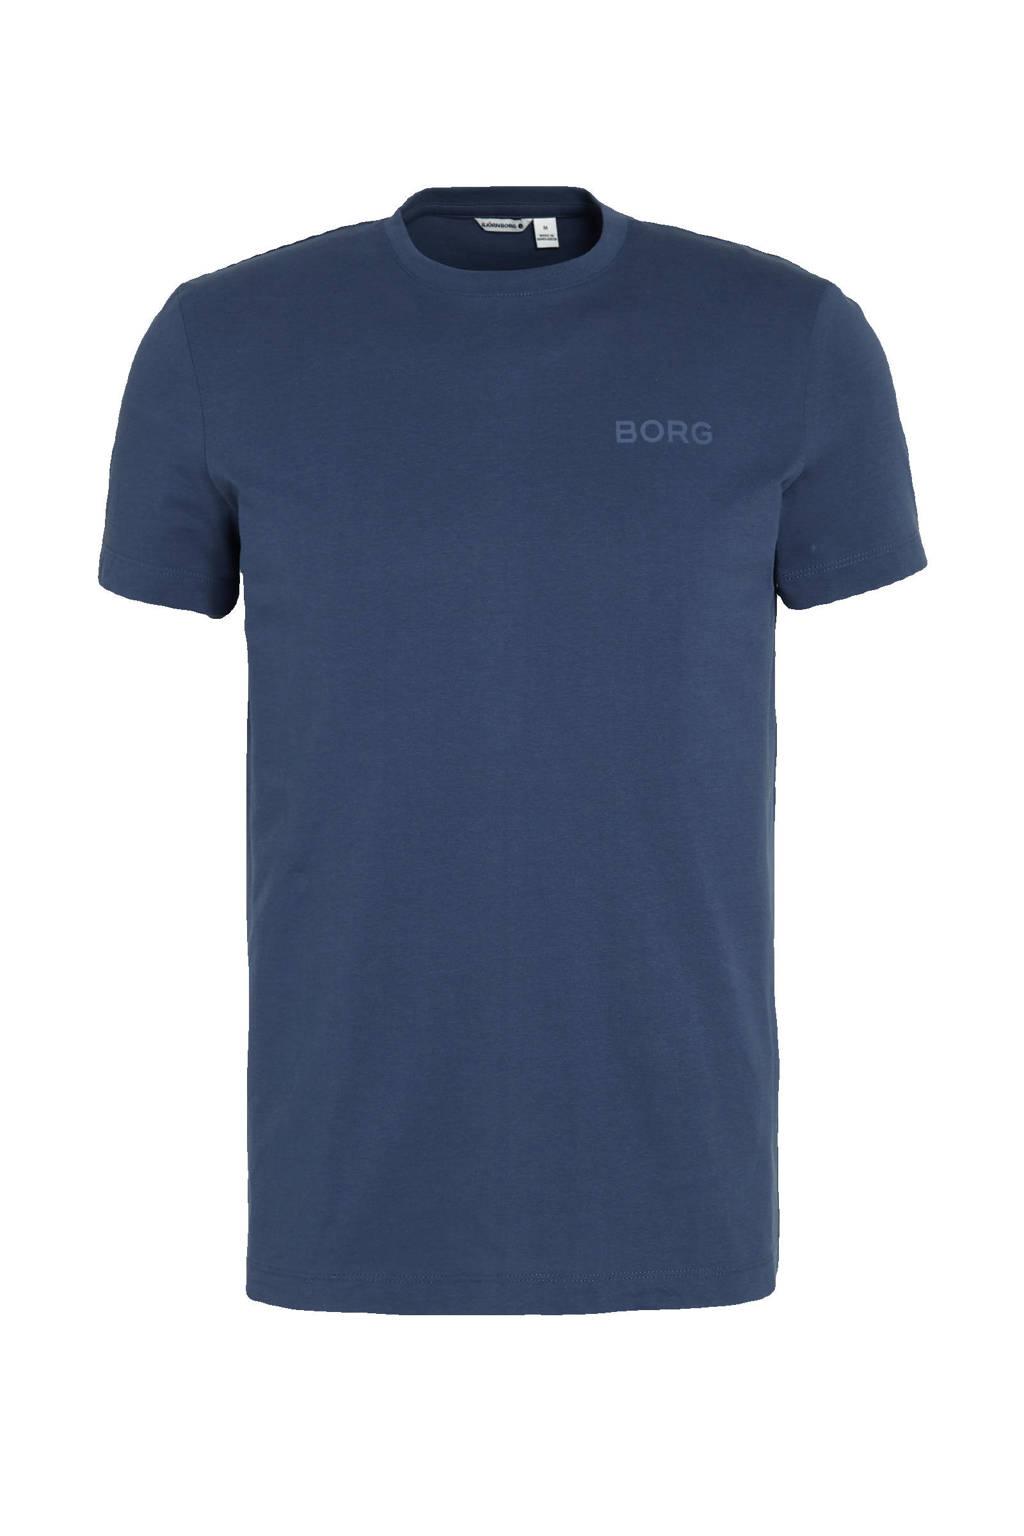 Björn Borg   sport T-shirt donkerblauw, Donkerblauw